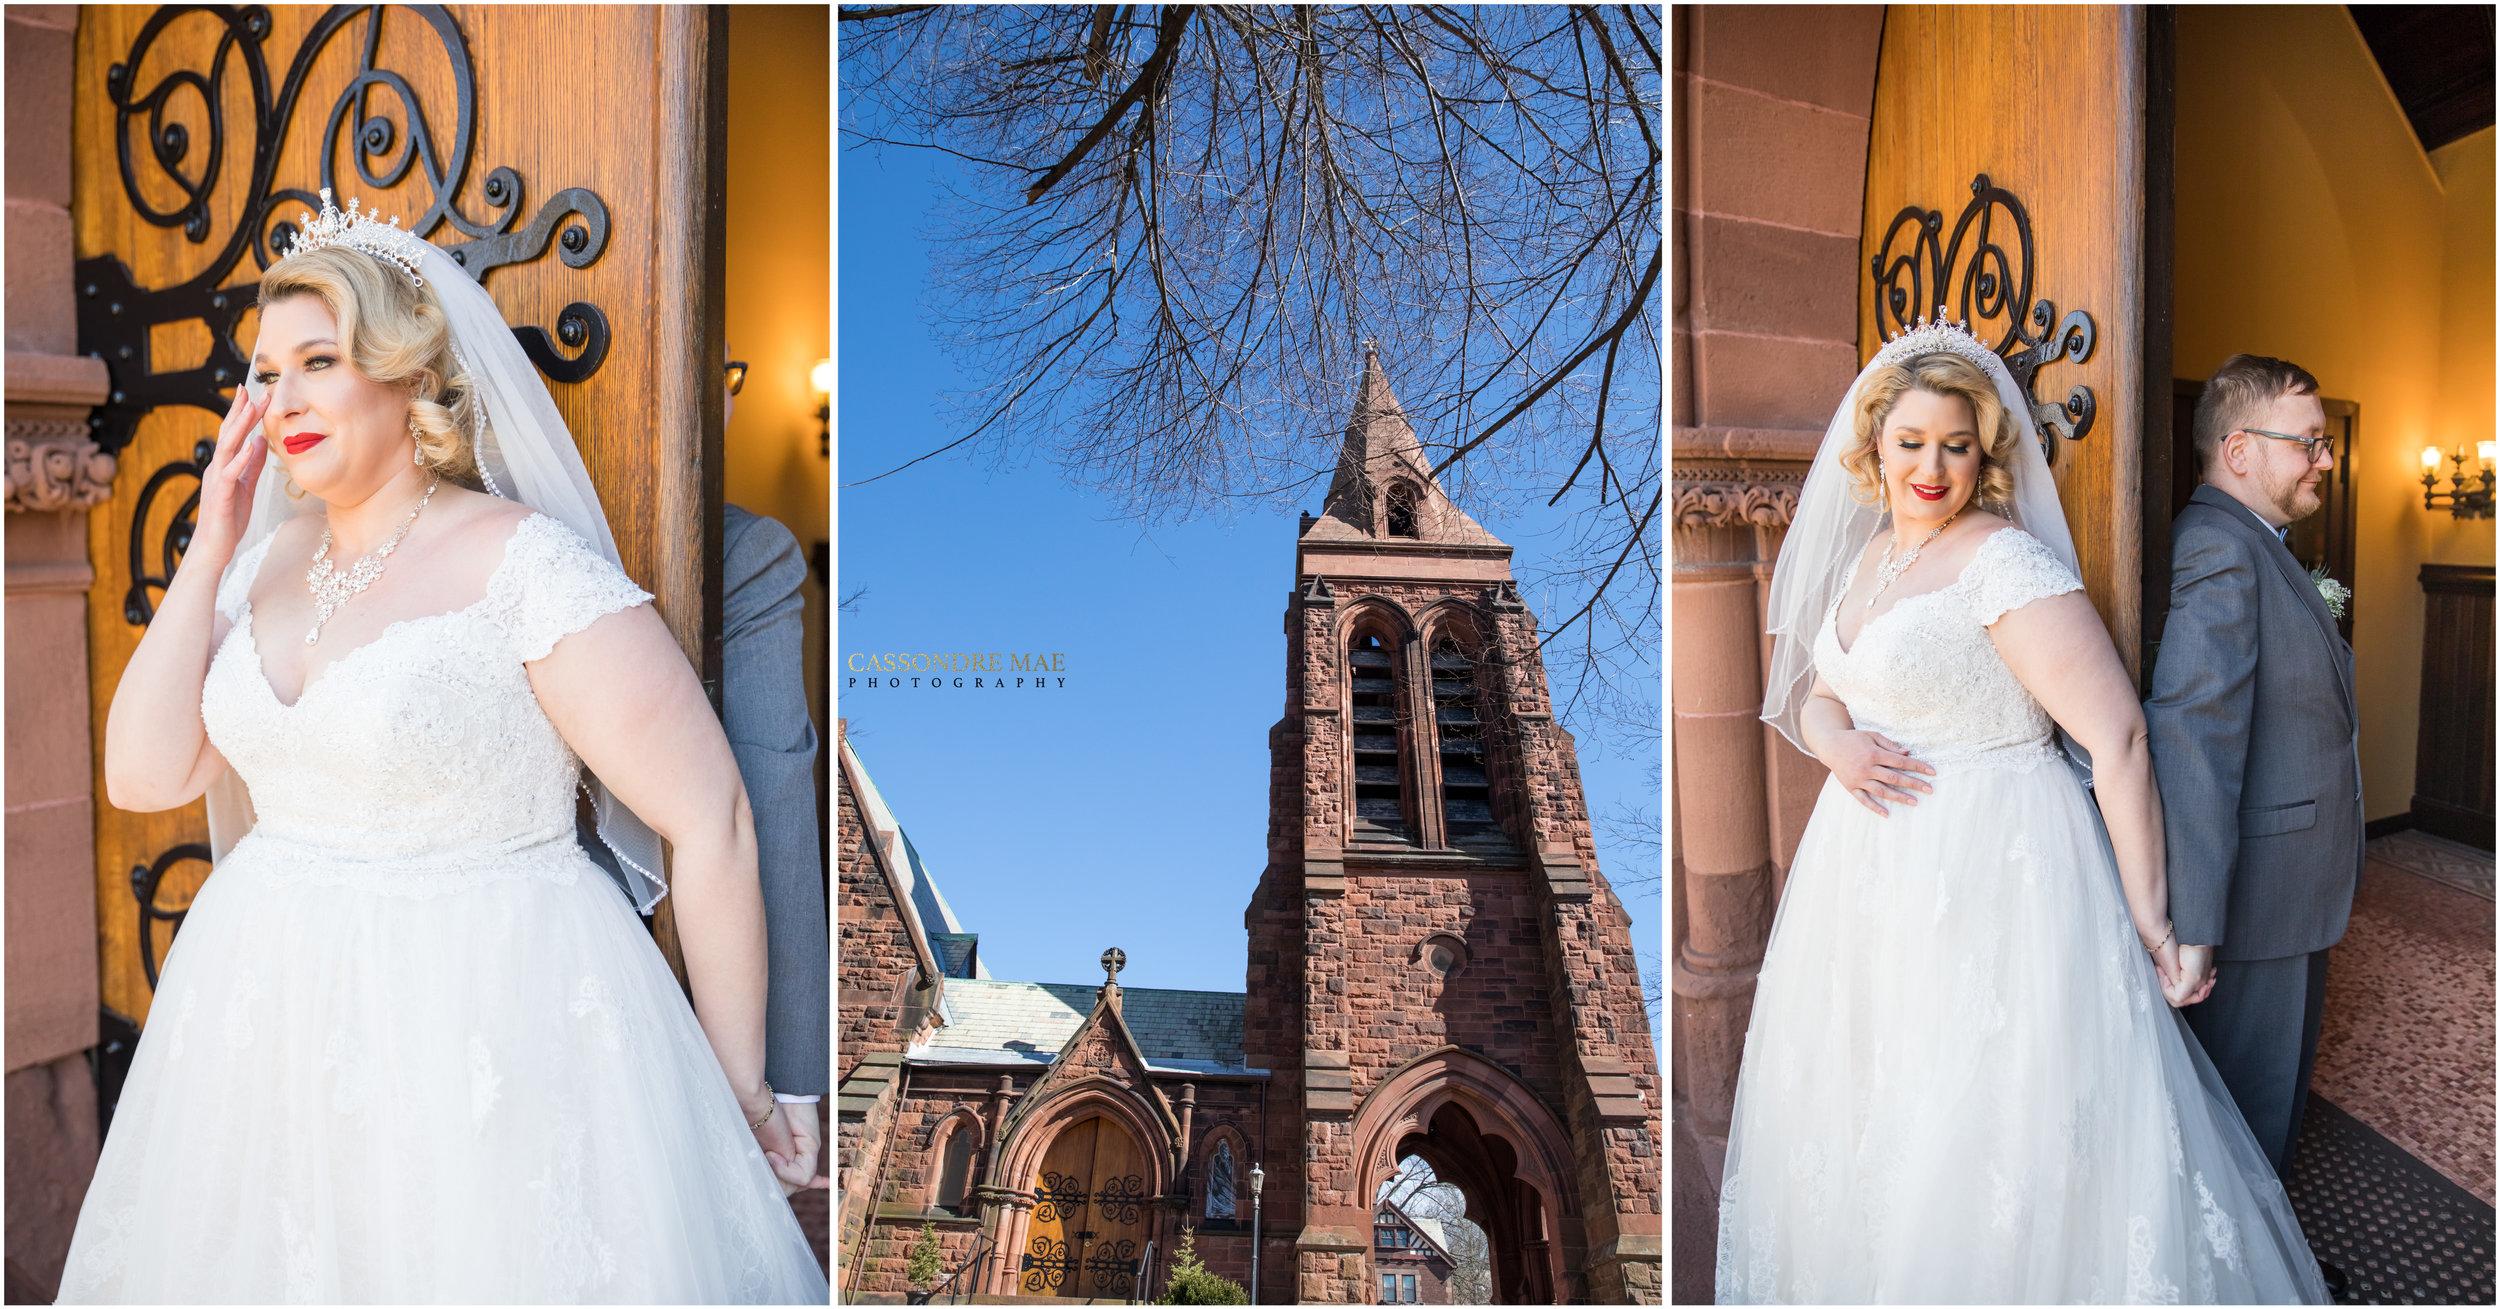 Cassondre Mae Photography Poughkeepsie NY Wedding 12.jpg